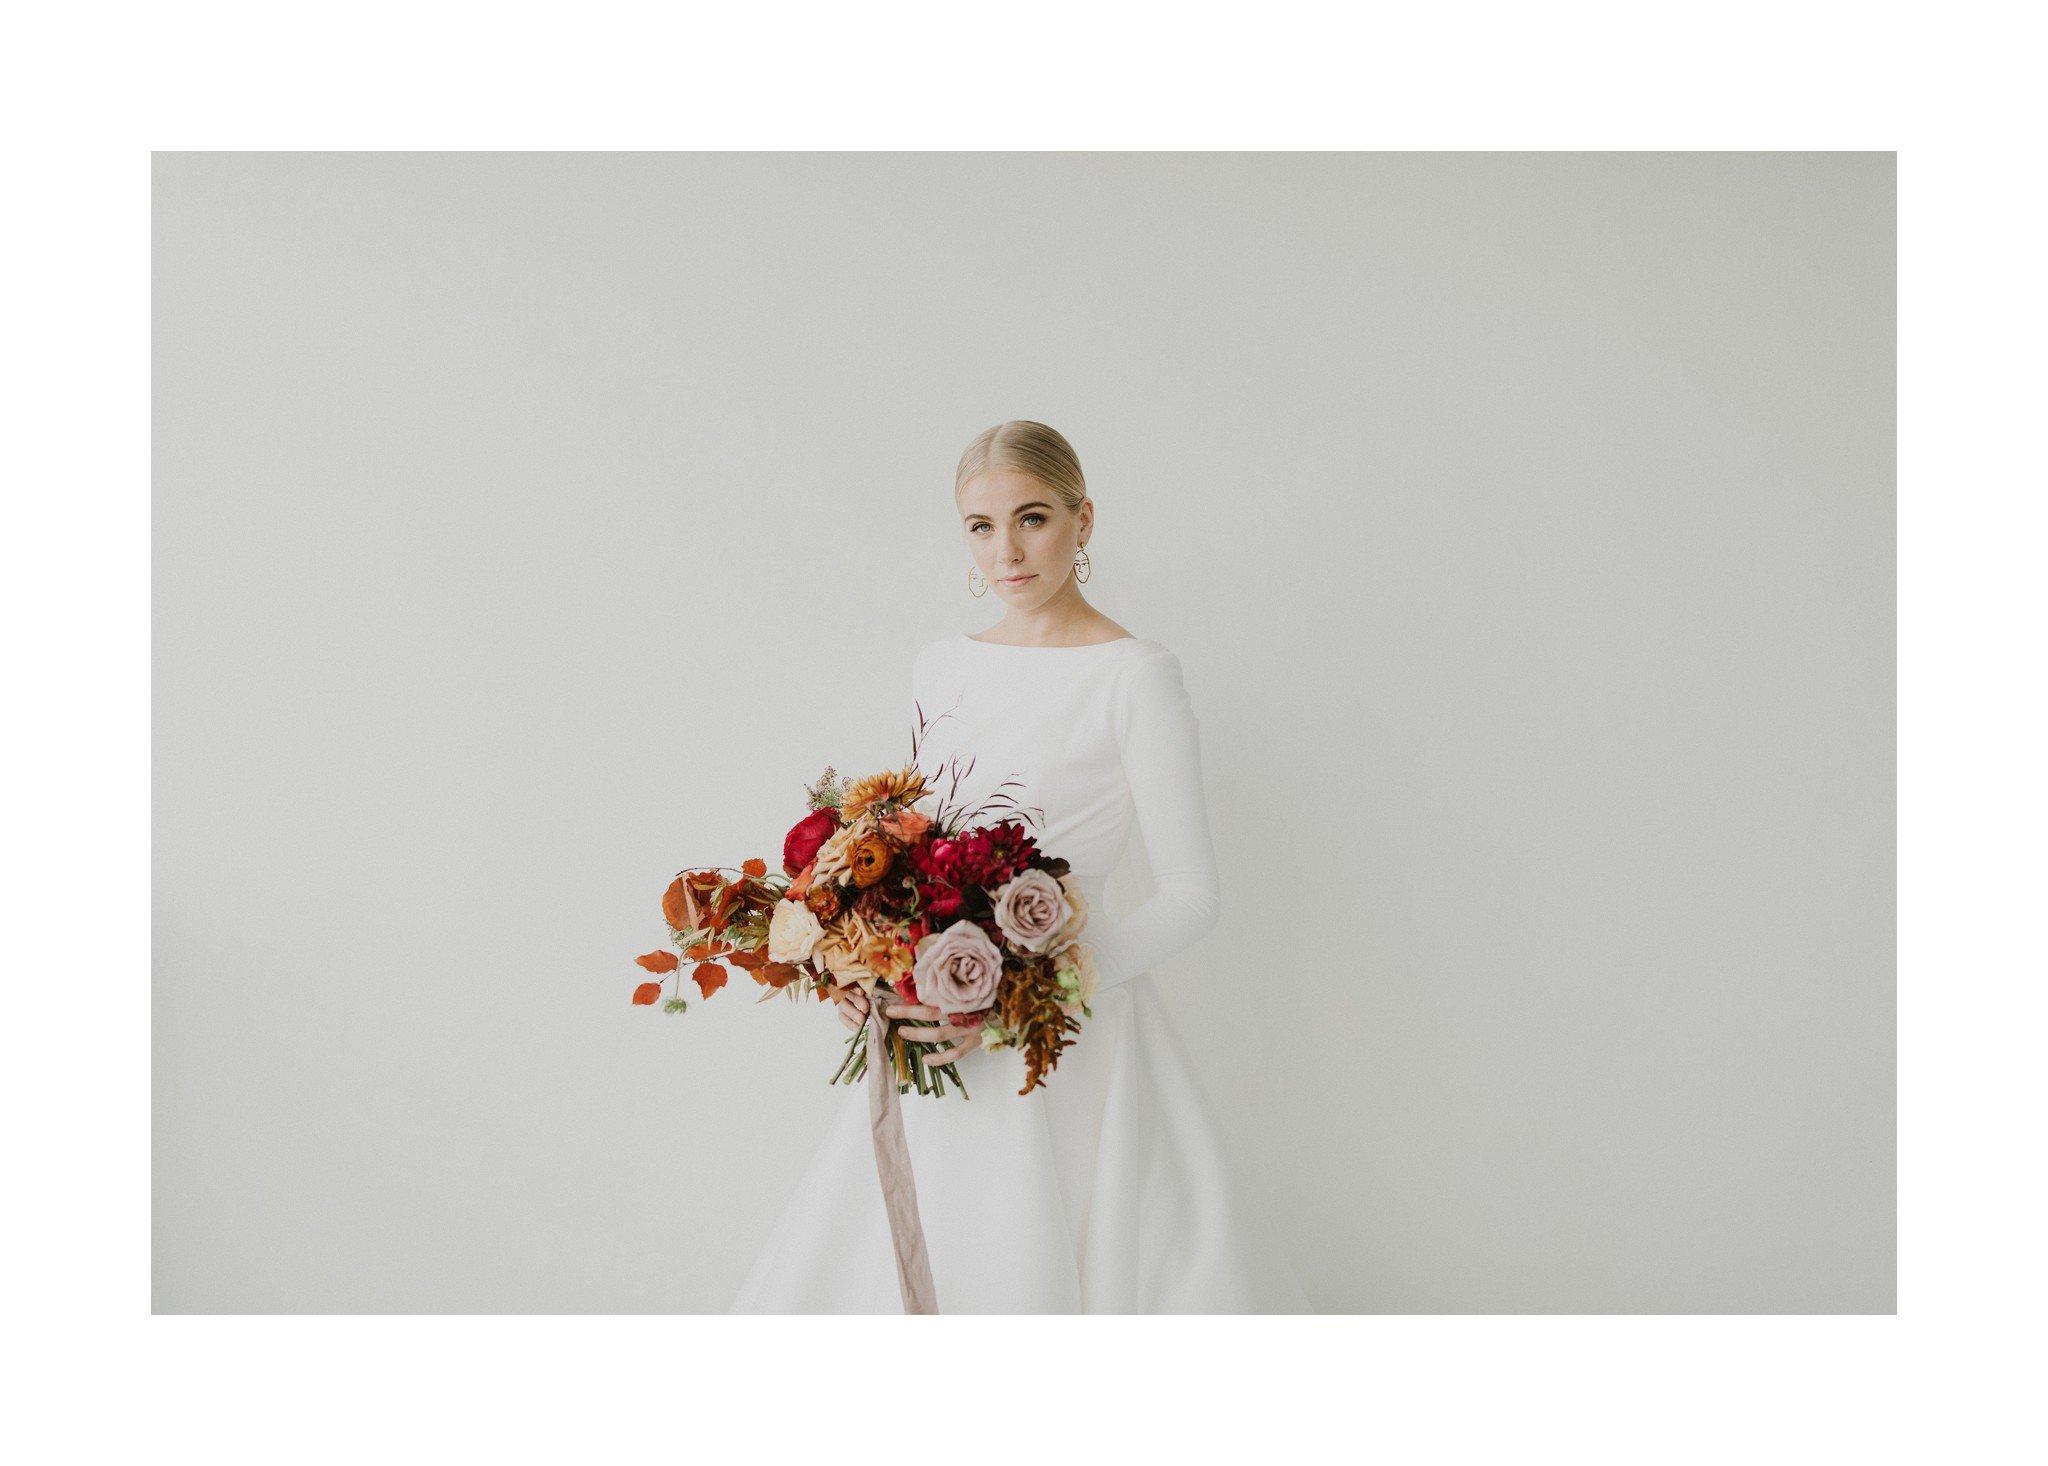 The W Hotel South Beach Destination Wedding Photographer